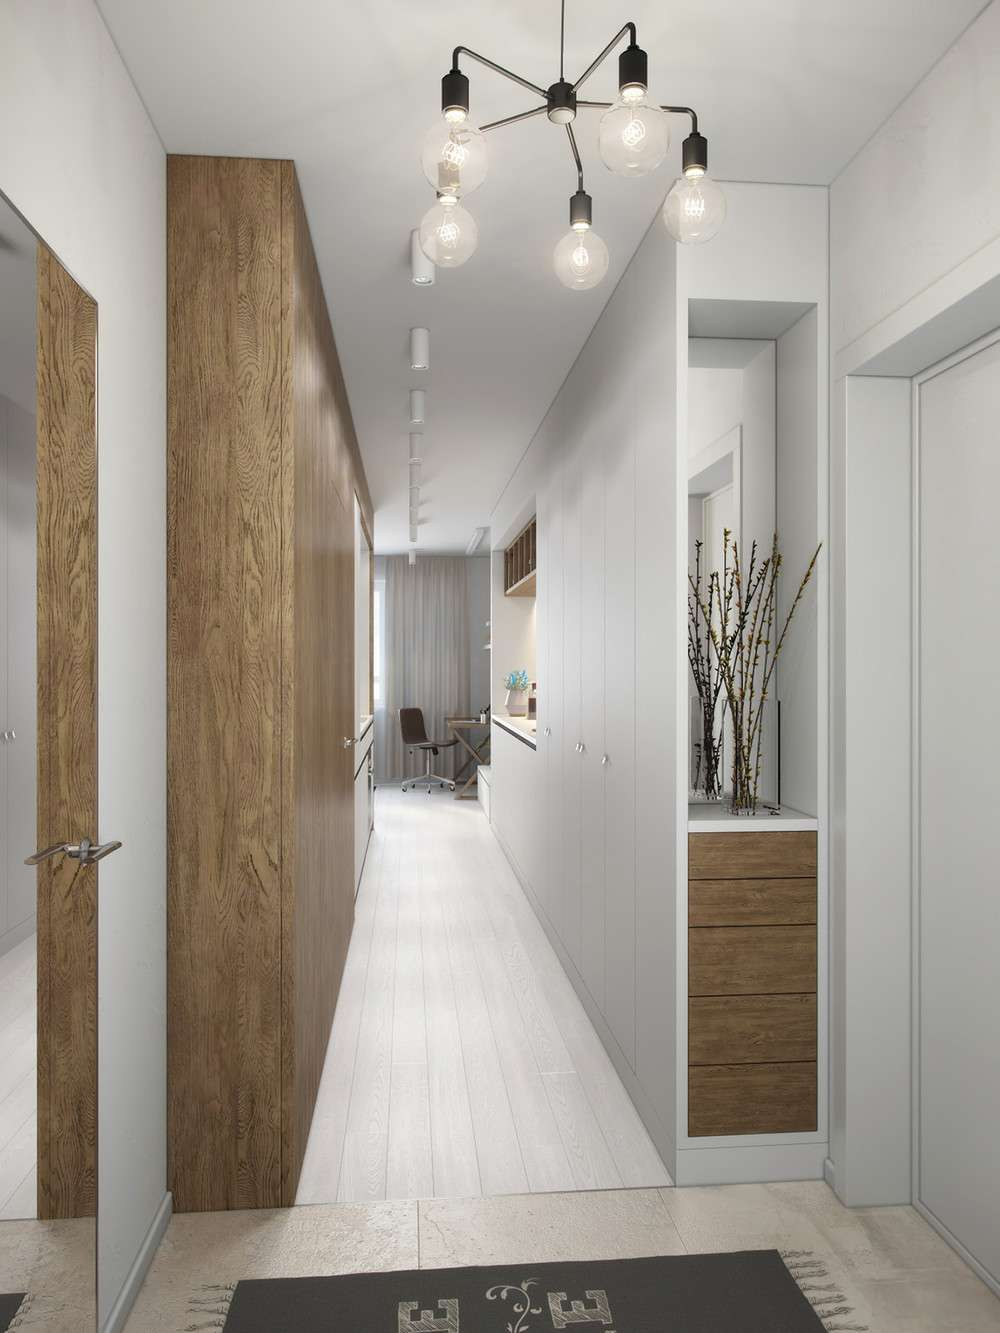 Decoracion de apartamentos peque os dise os de moda for Disenos de departamentos pequenos